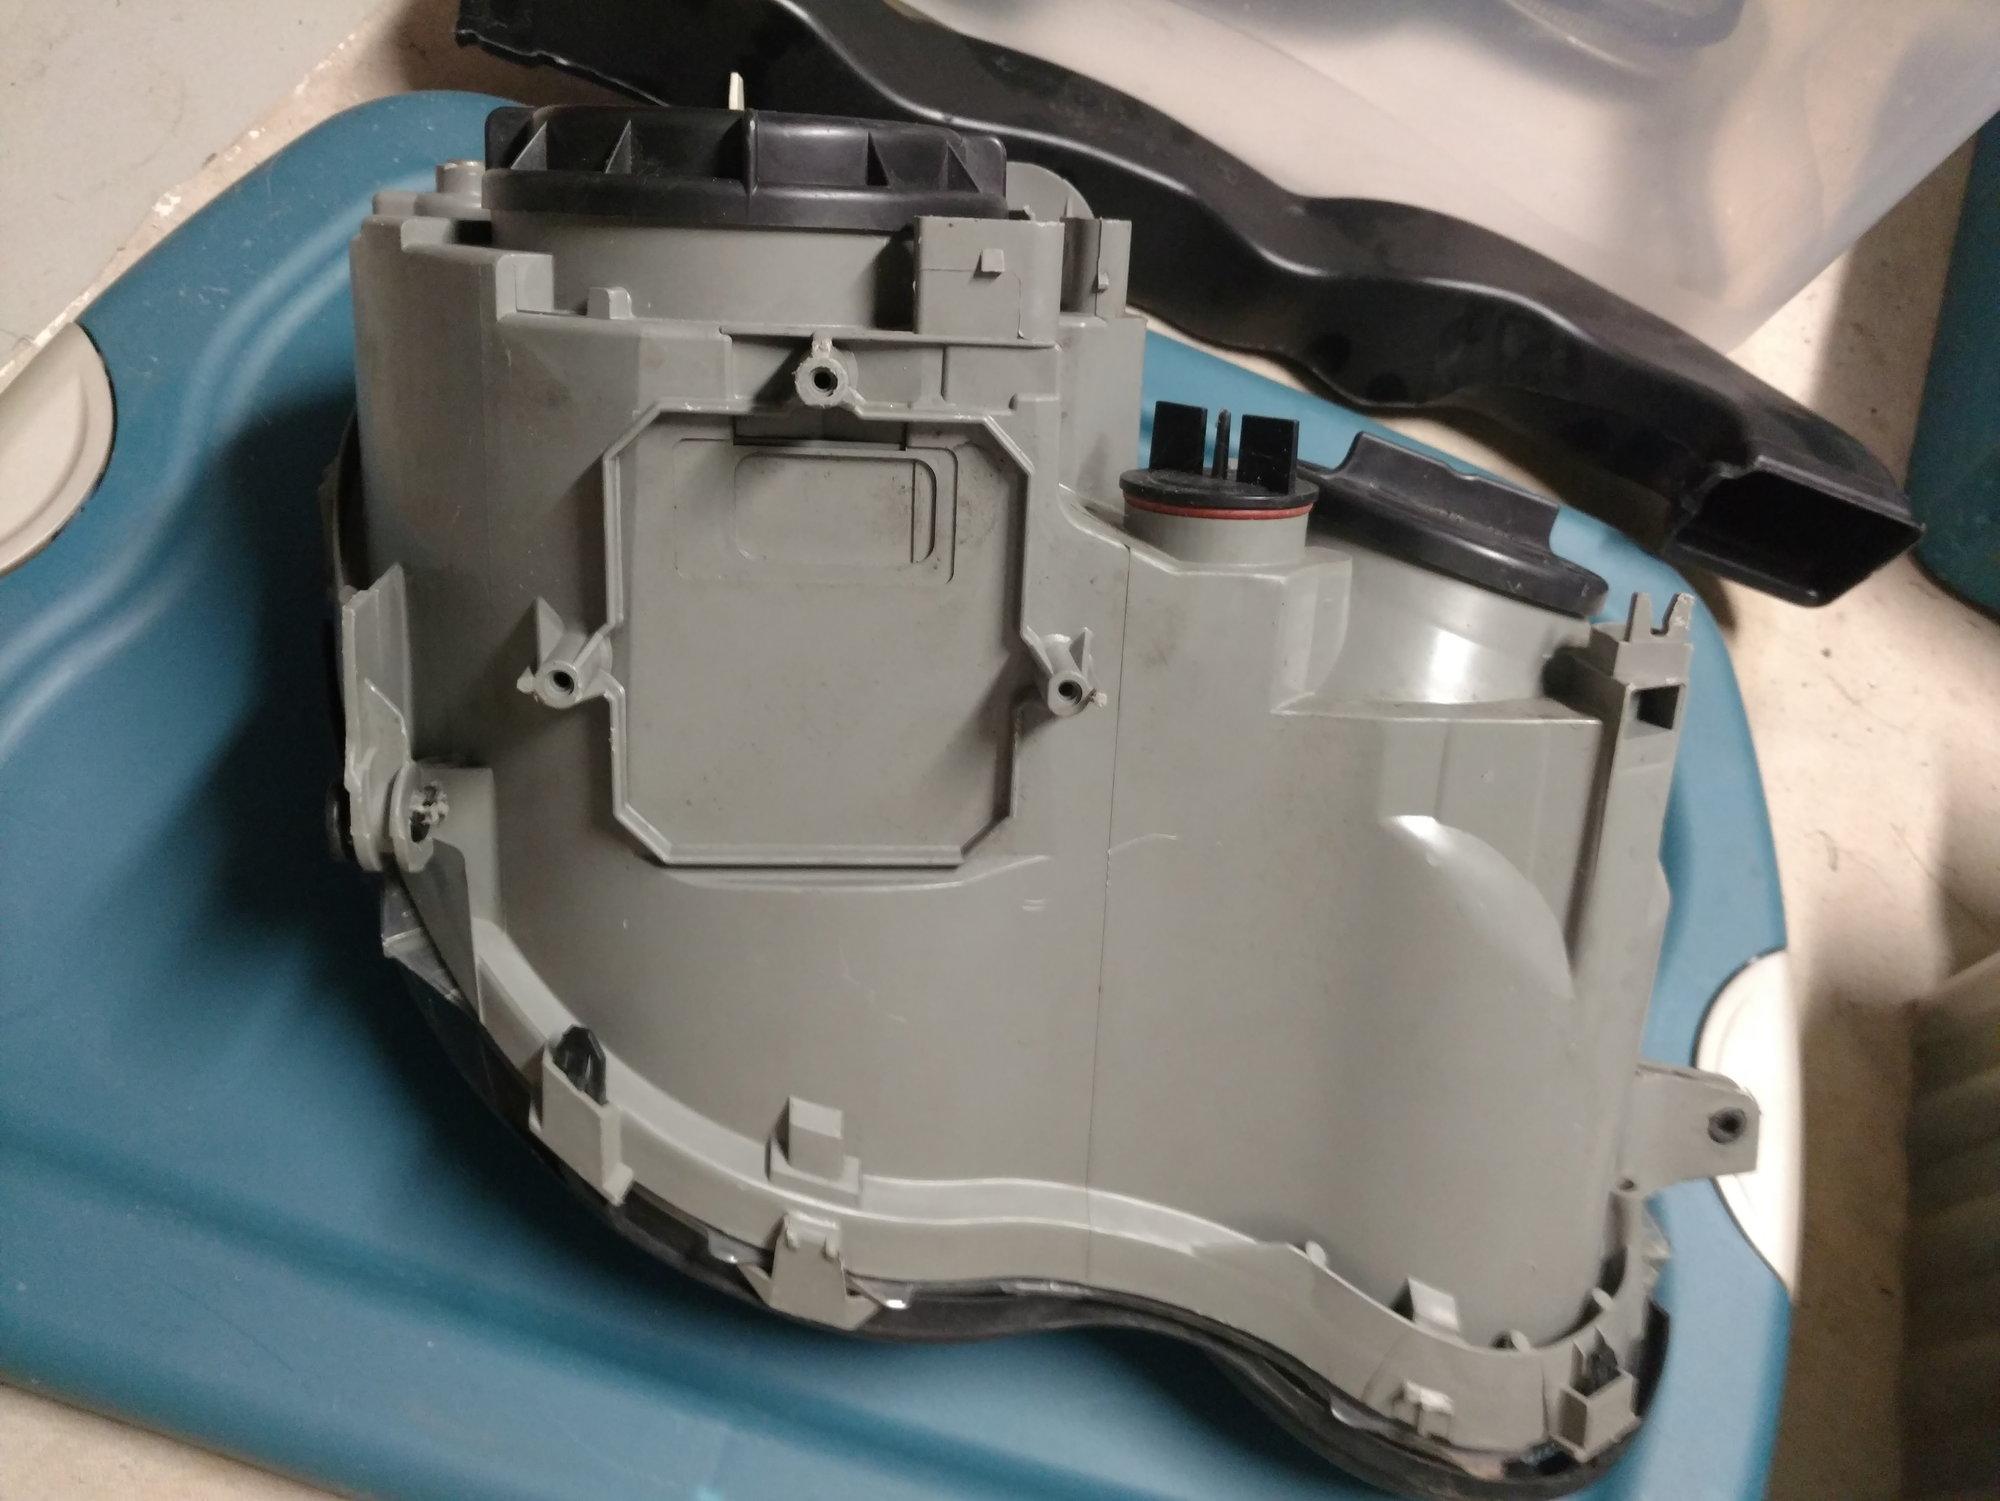 W203 C230 Part-Out: Coupe Headlamps, Front Clip + Misc Interior/Exterior